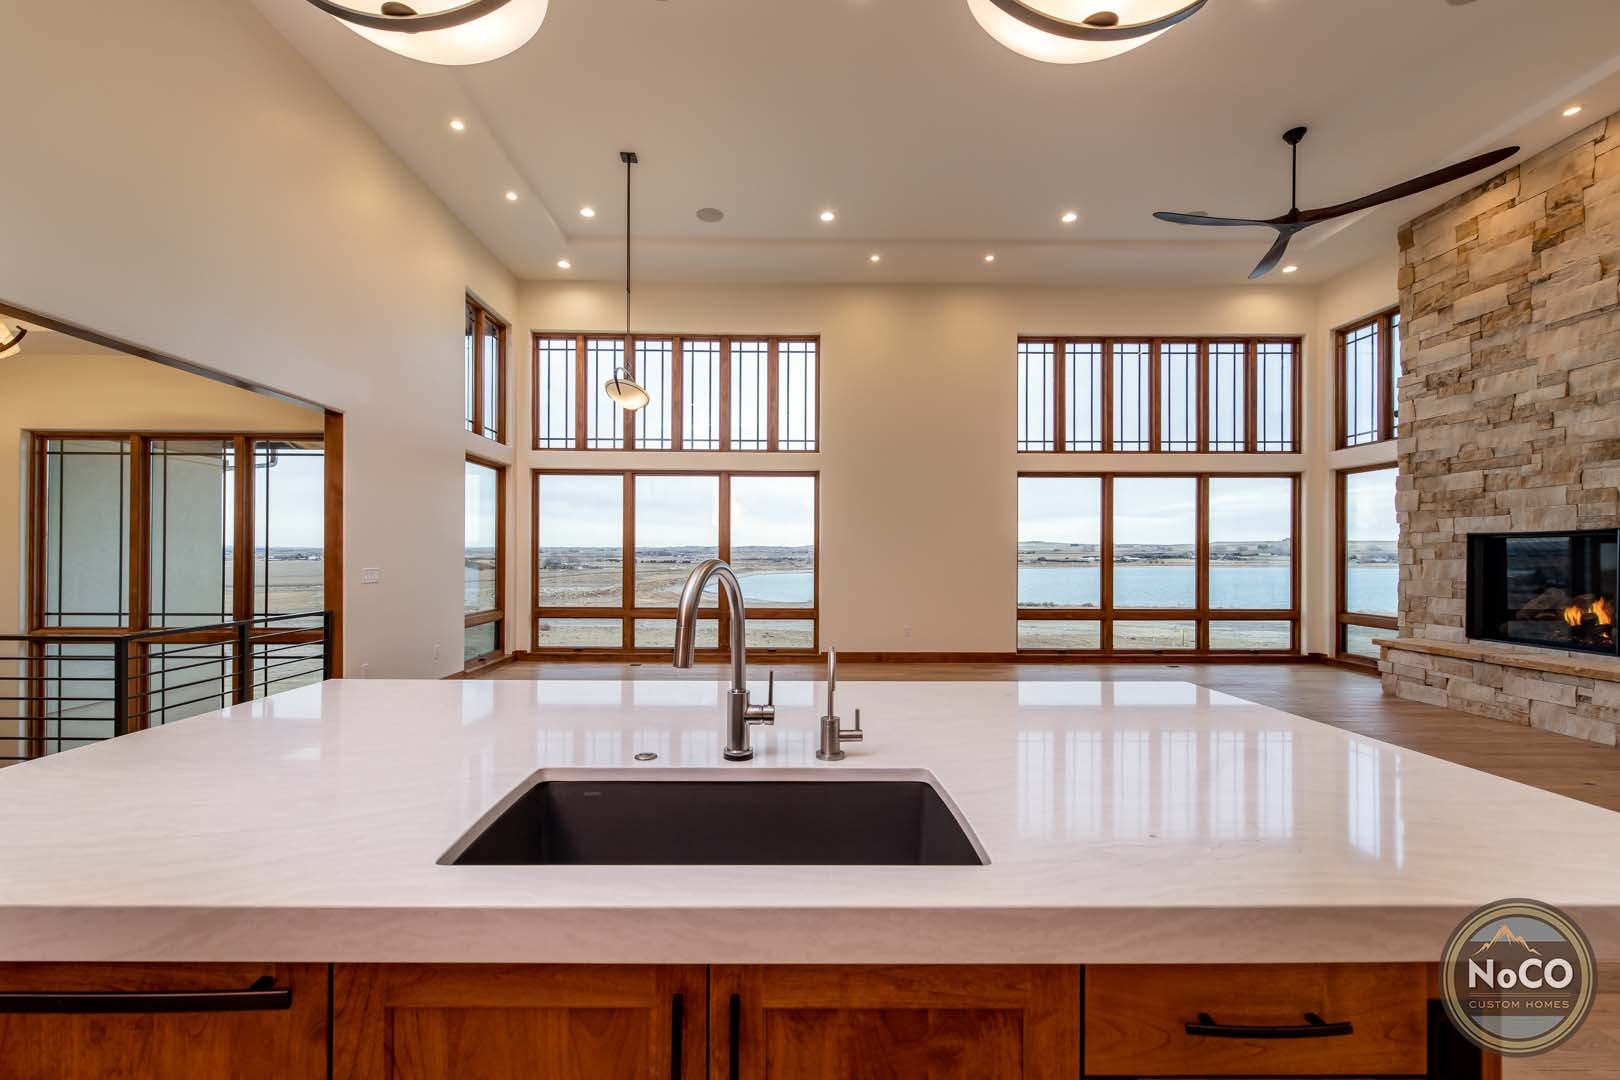 colorado custom home kitchen island open concept